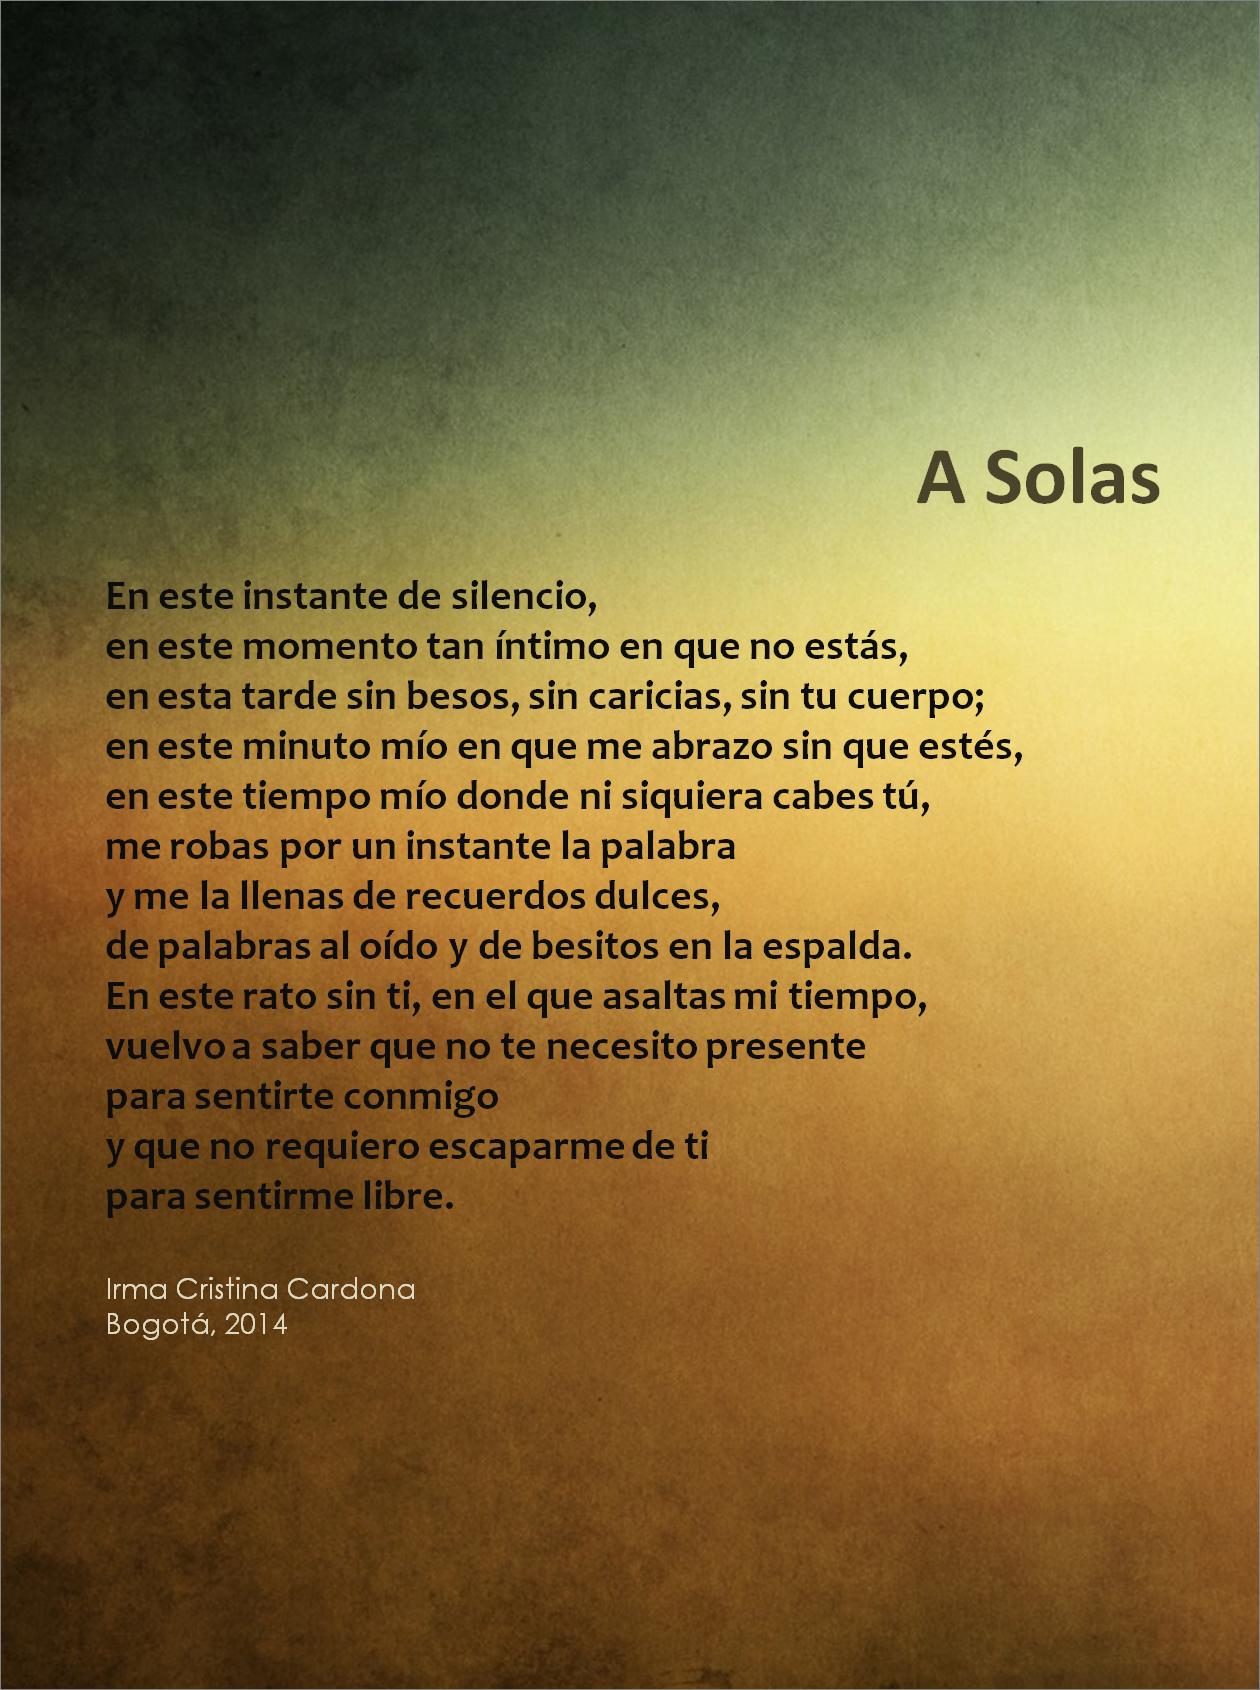 A Solas Irma Cristina Cardona Frases Besos Y Poemas